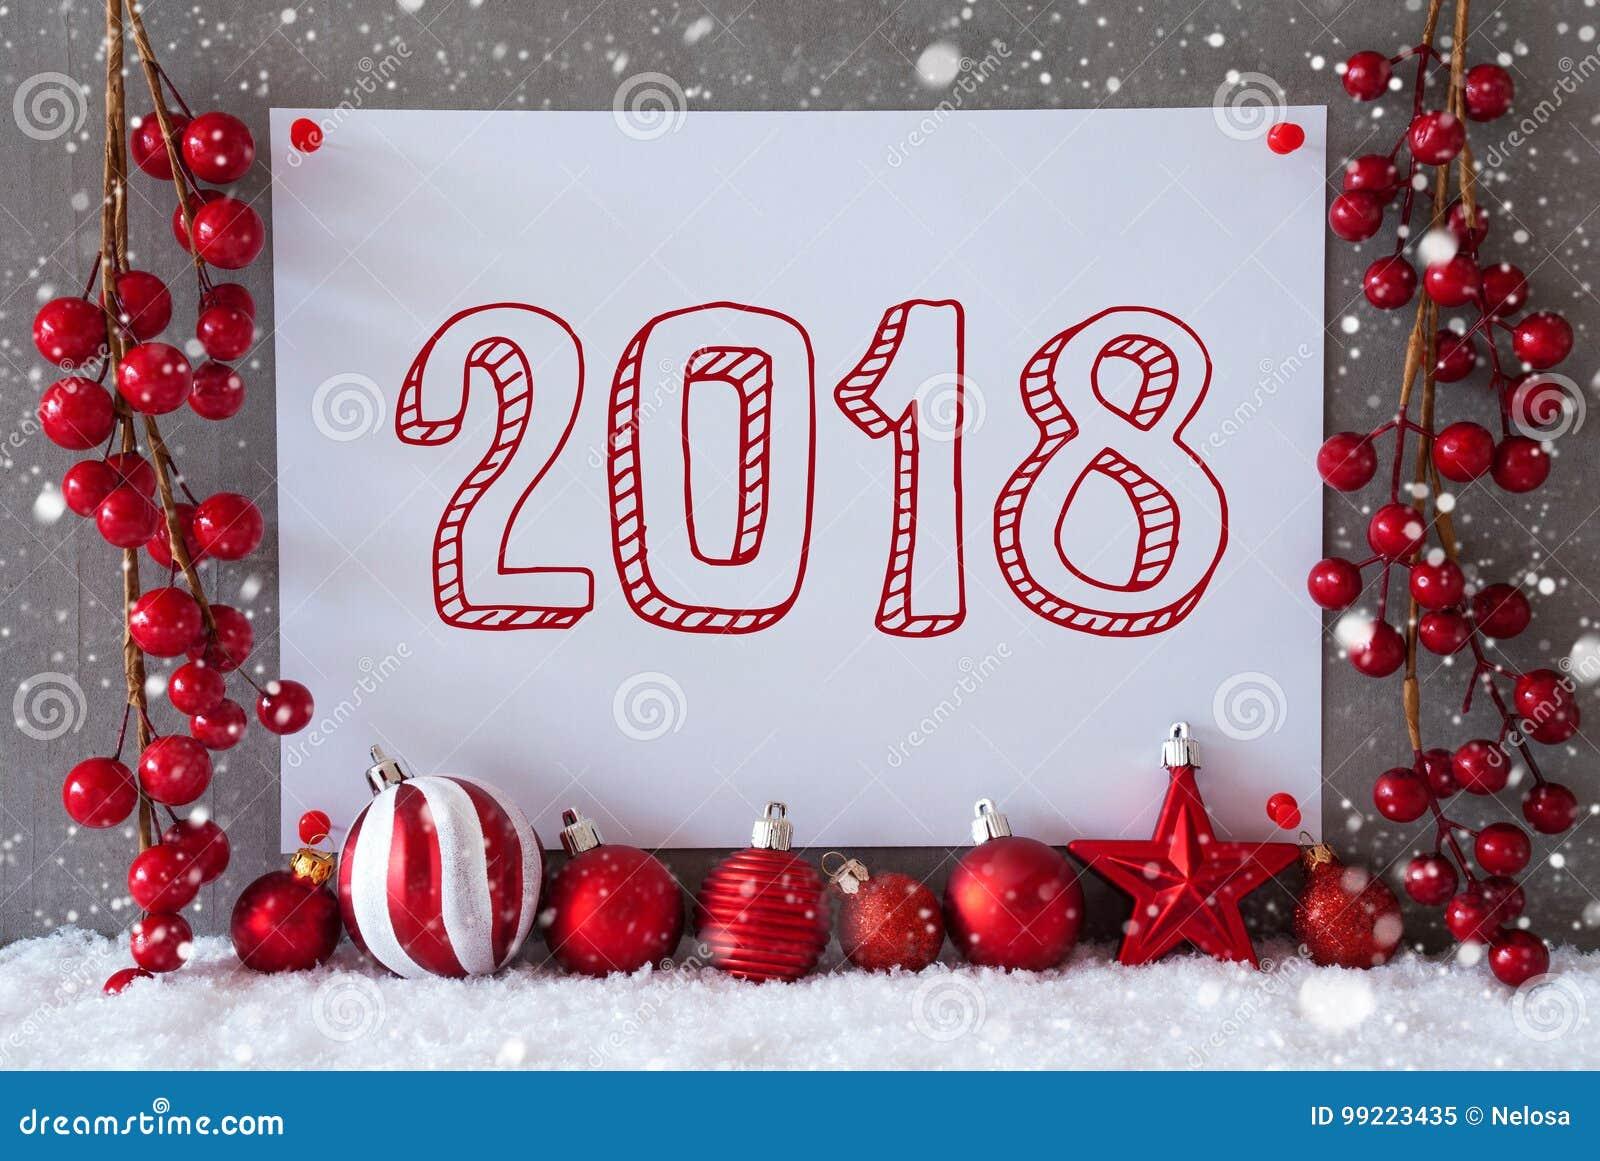 noel 2018 neige Label, Flocons De Neige, Boules De Noël, Texte 2018 Image stock  noel 2018 neige